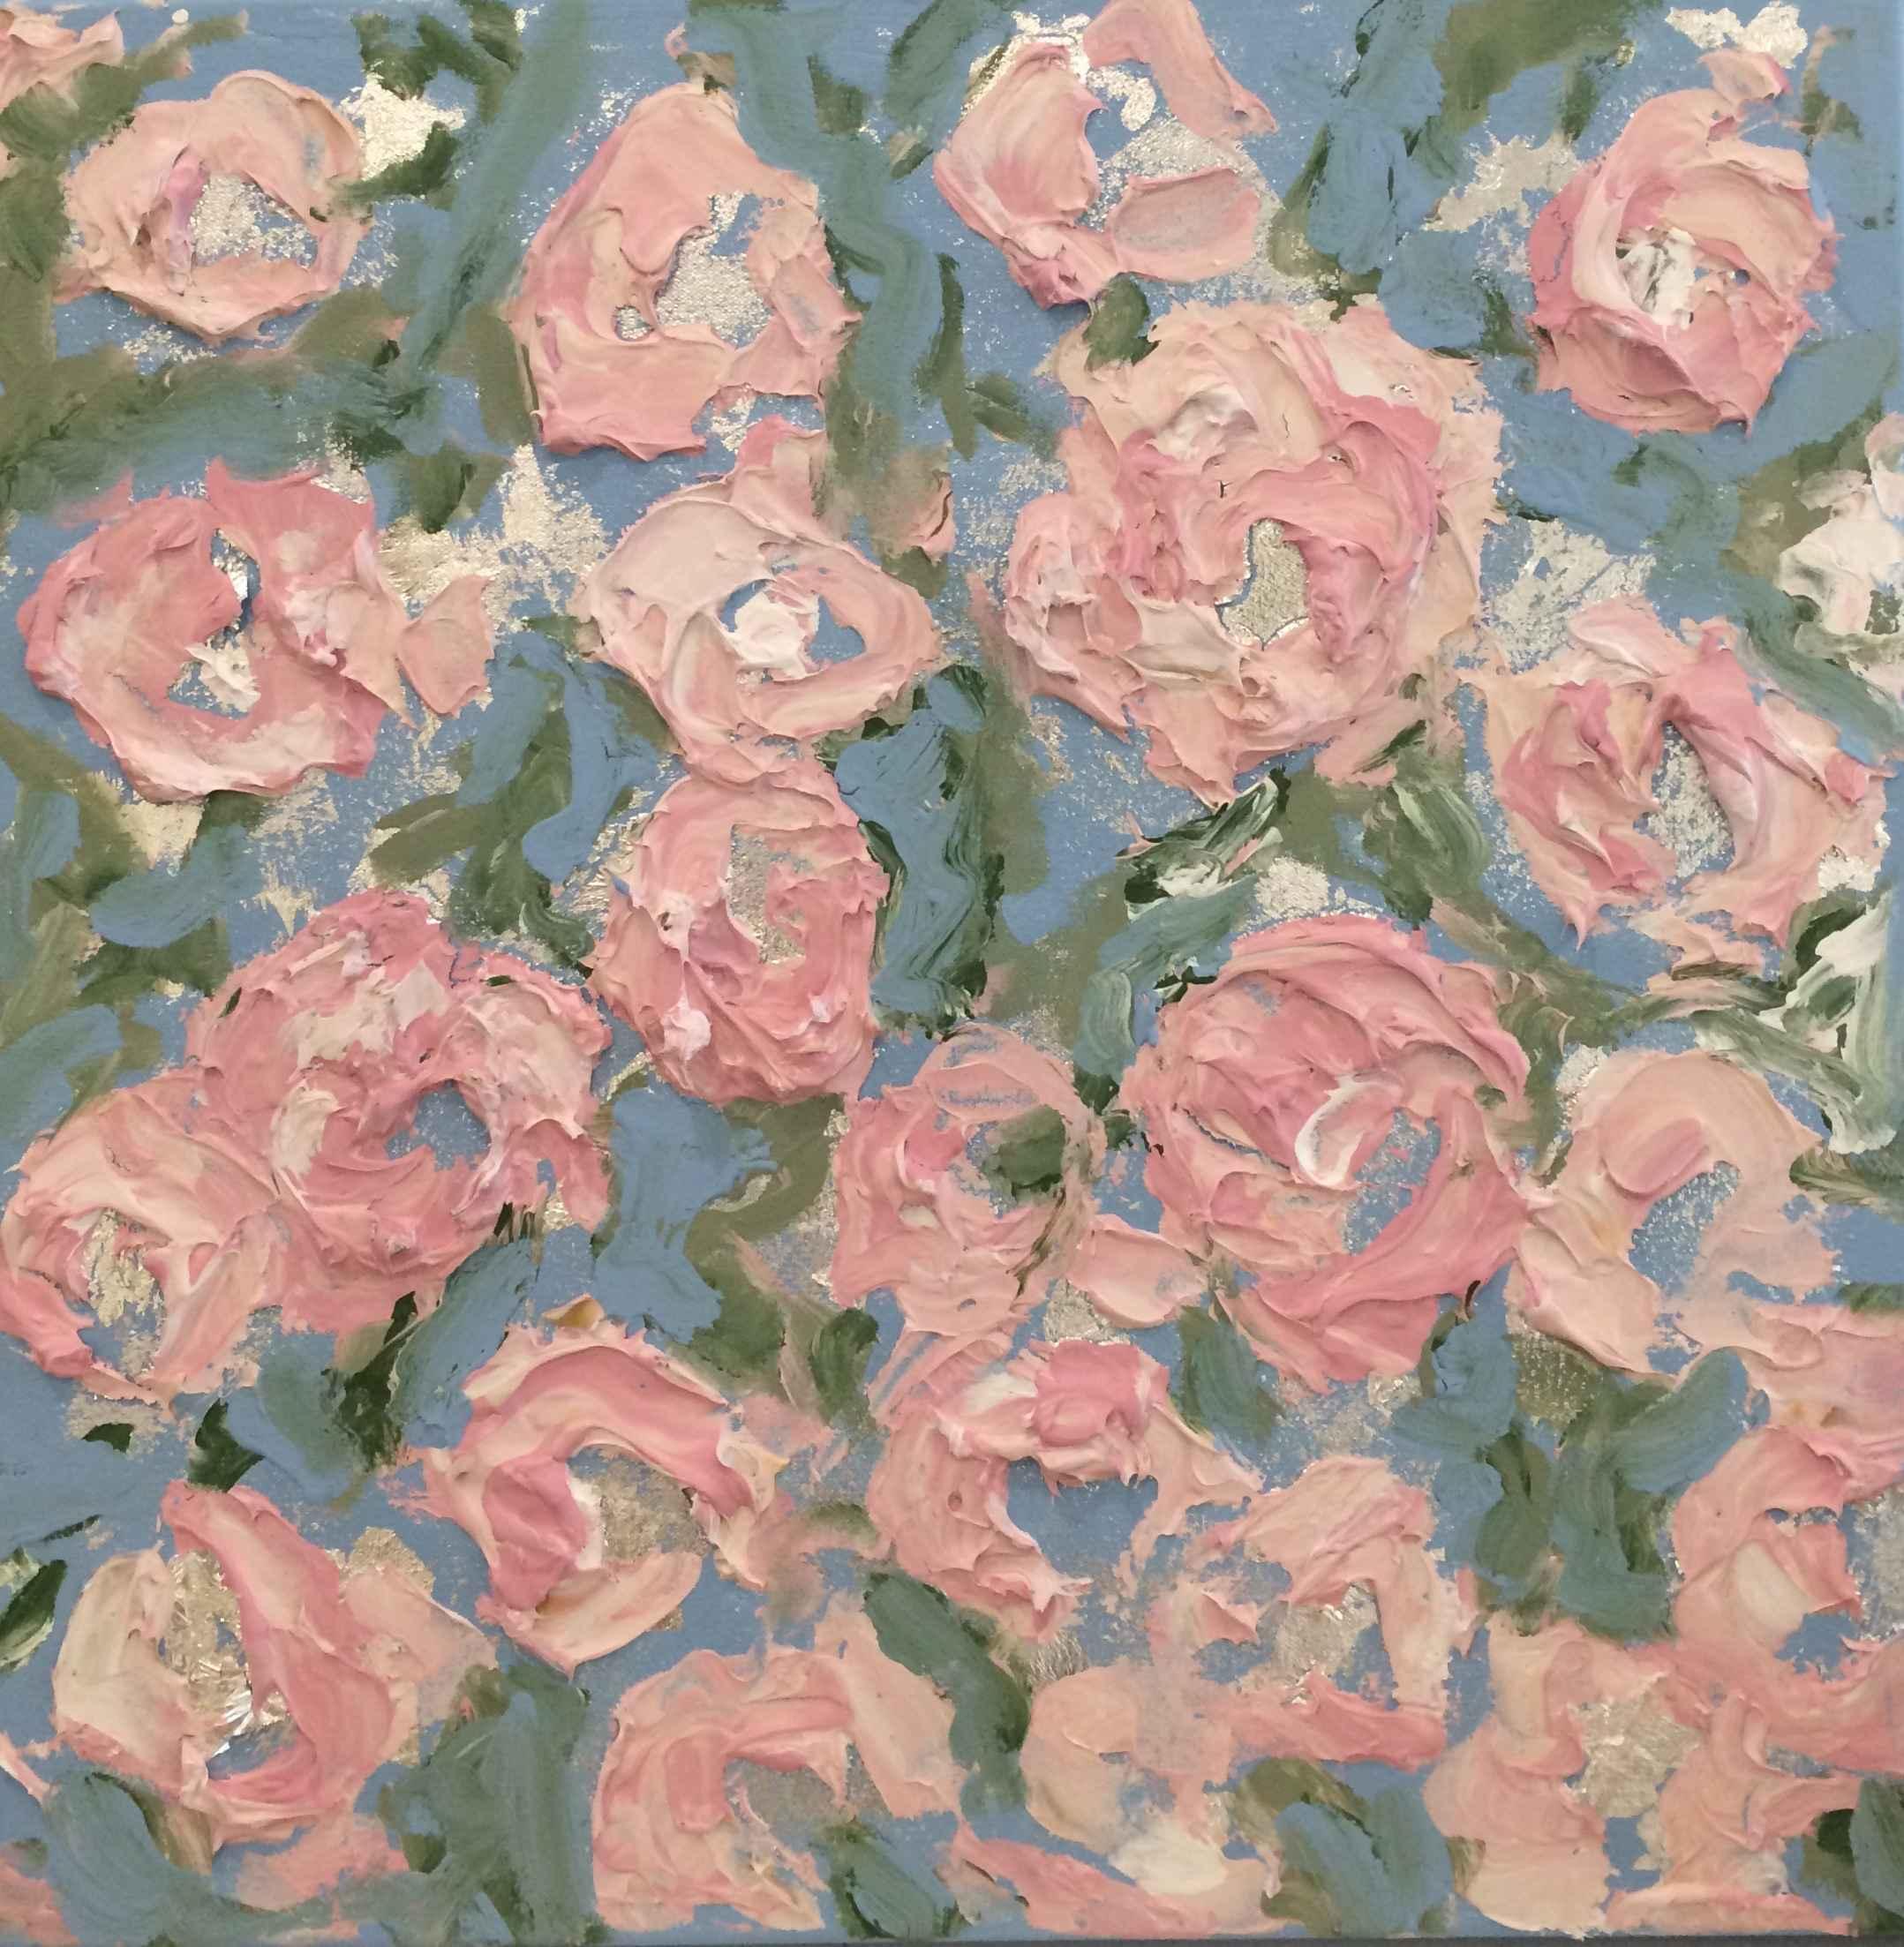 Rose Garden by  Steve Lyons - Masterpiece Online